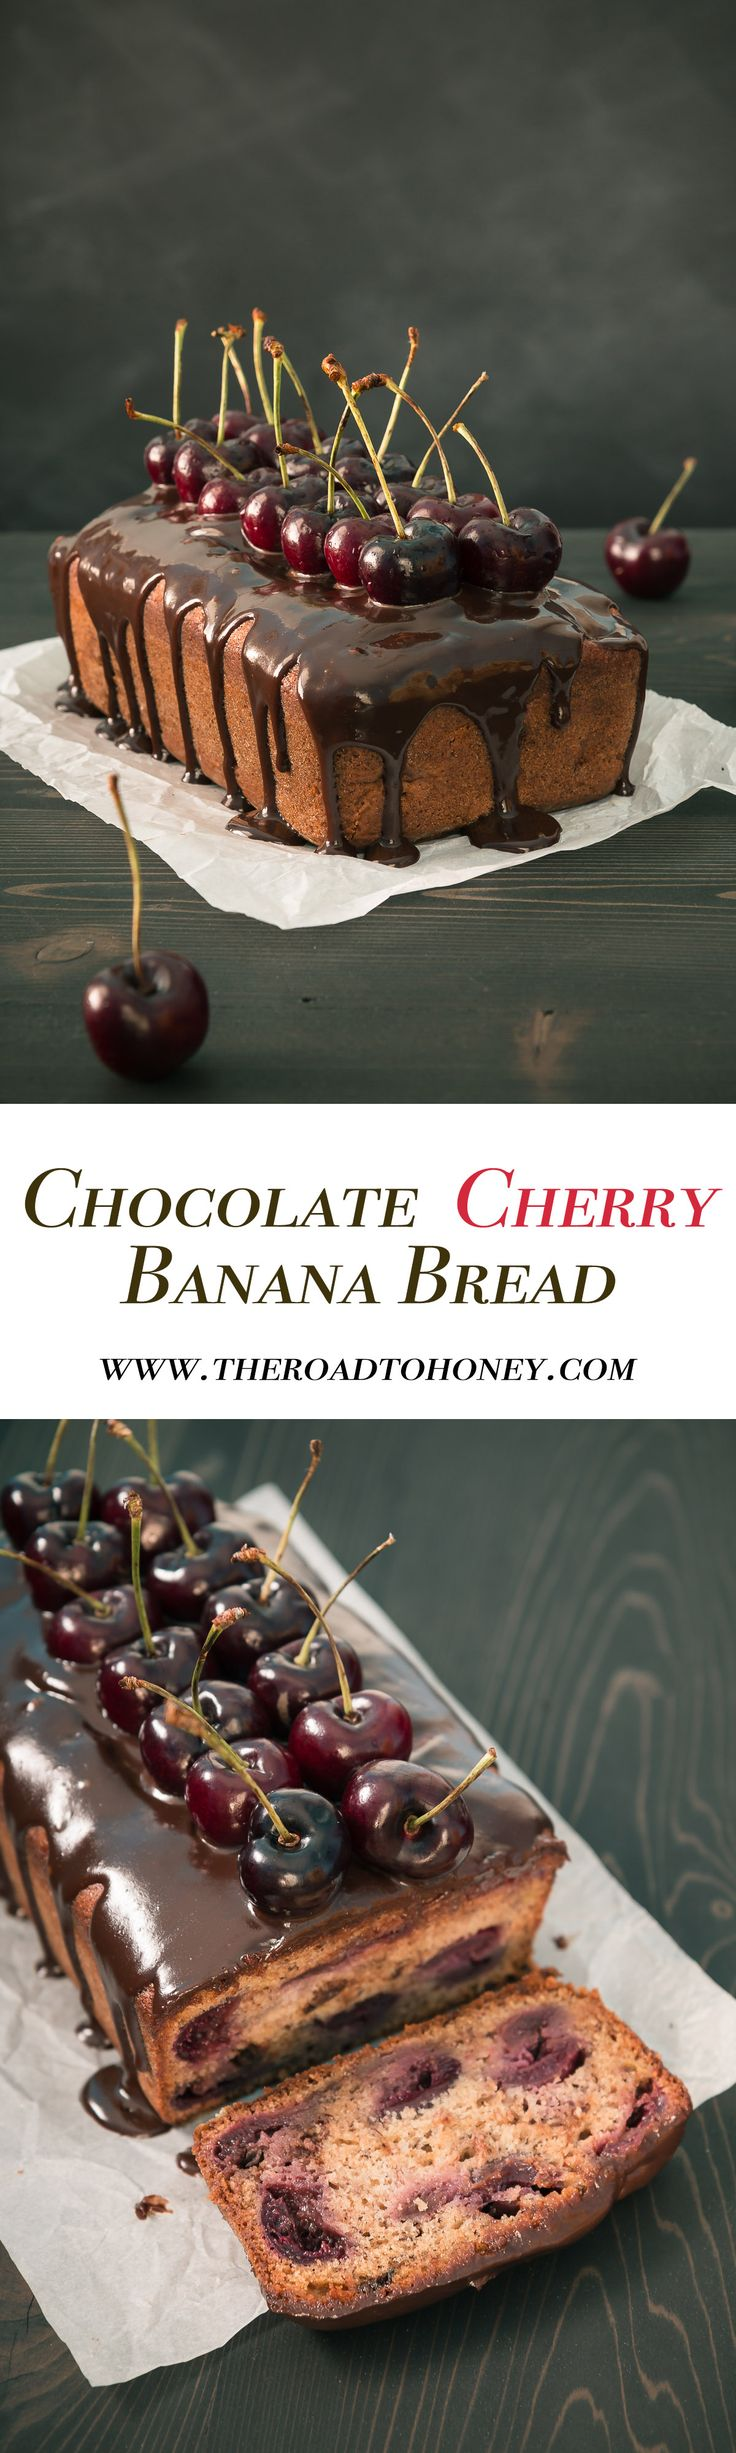 Chocolate Cherry Banana Bread - This elegant Chocolate Cherry Banana Bread is moist & delicious & sure to impress with juicy cherries, bits of chocolate, & a chocolate honey glaze.